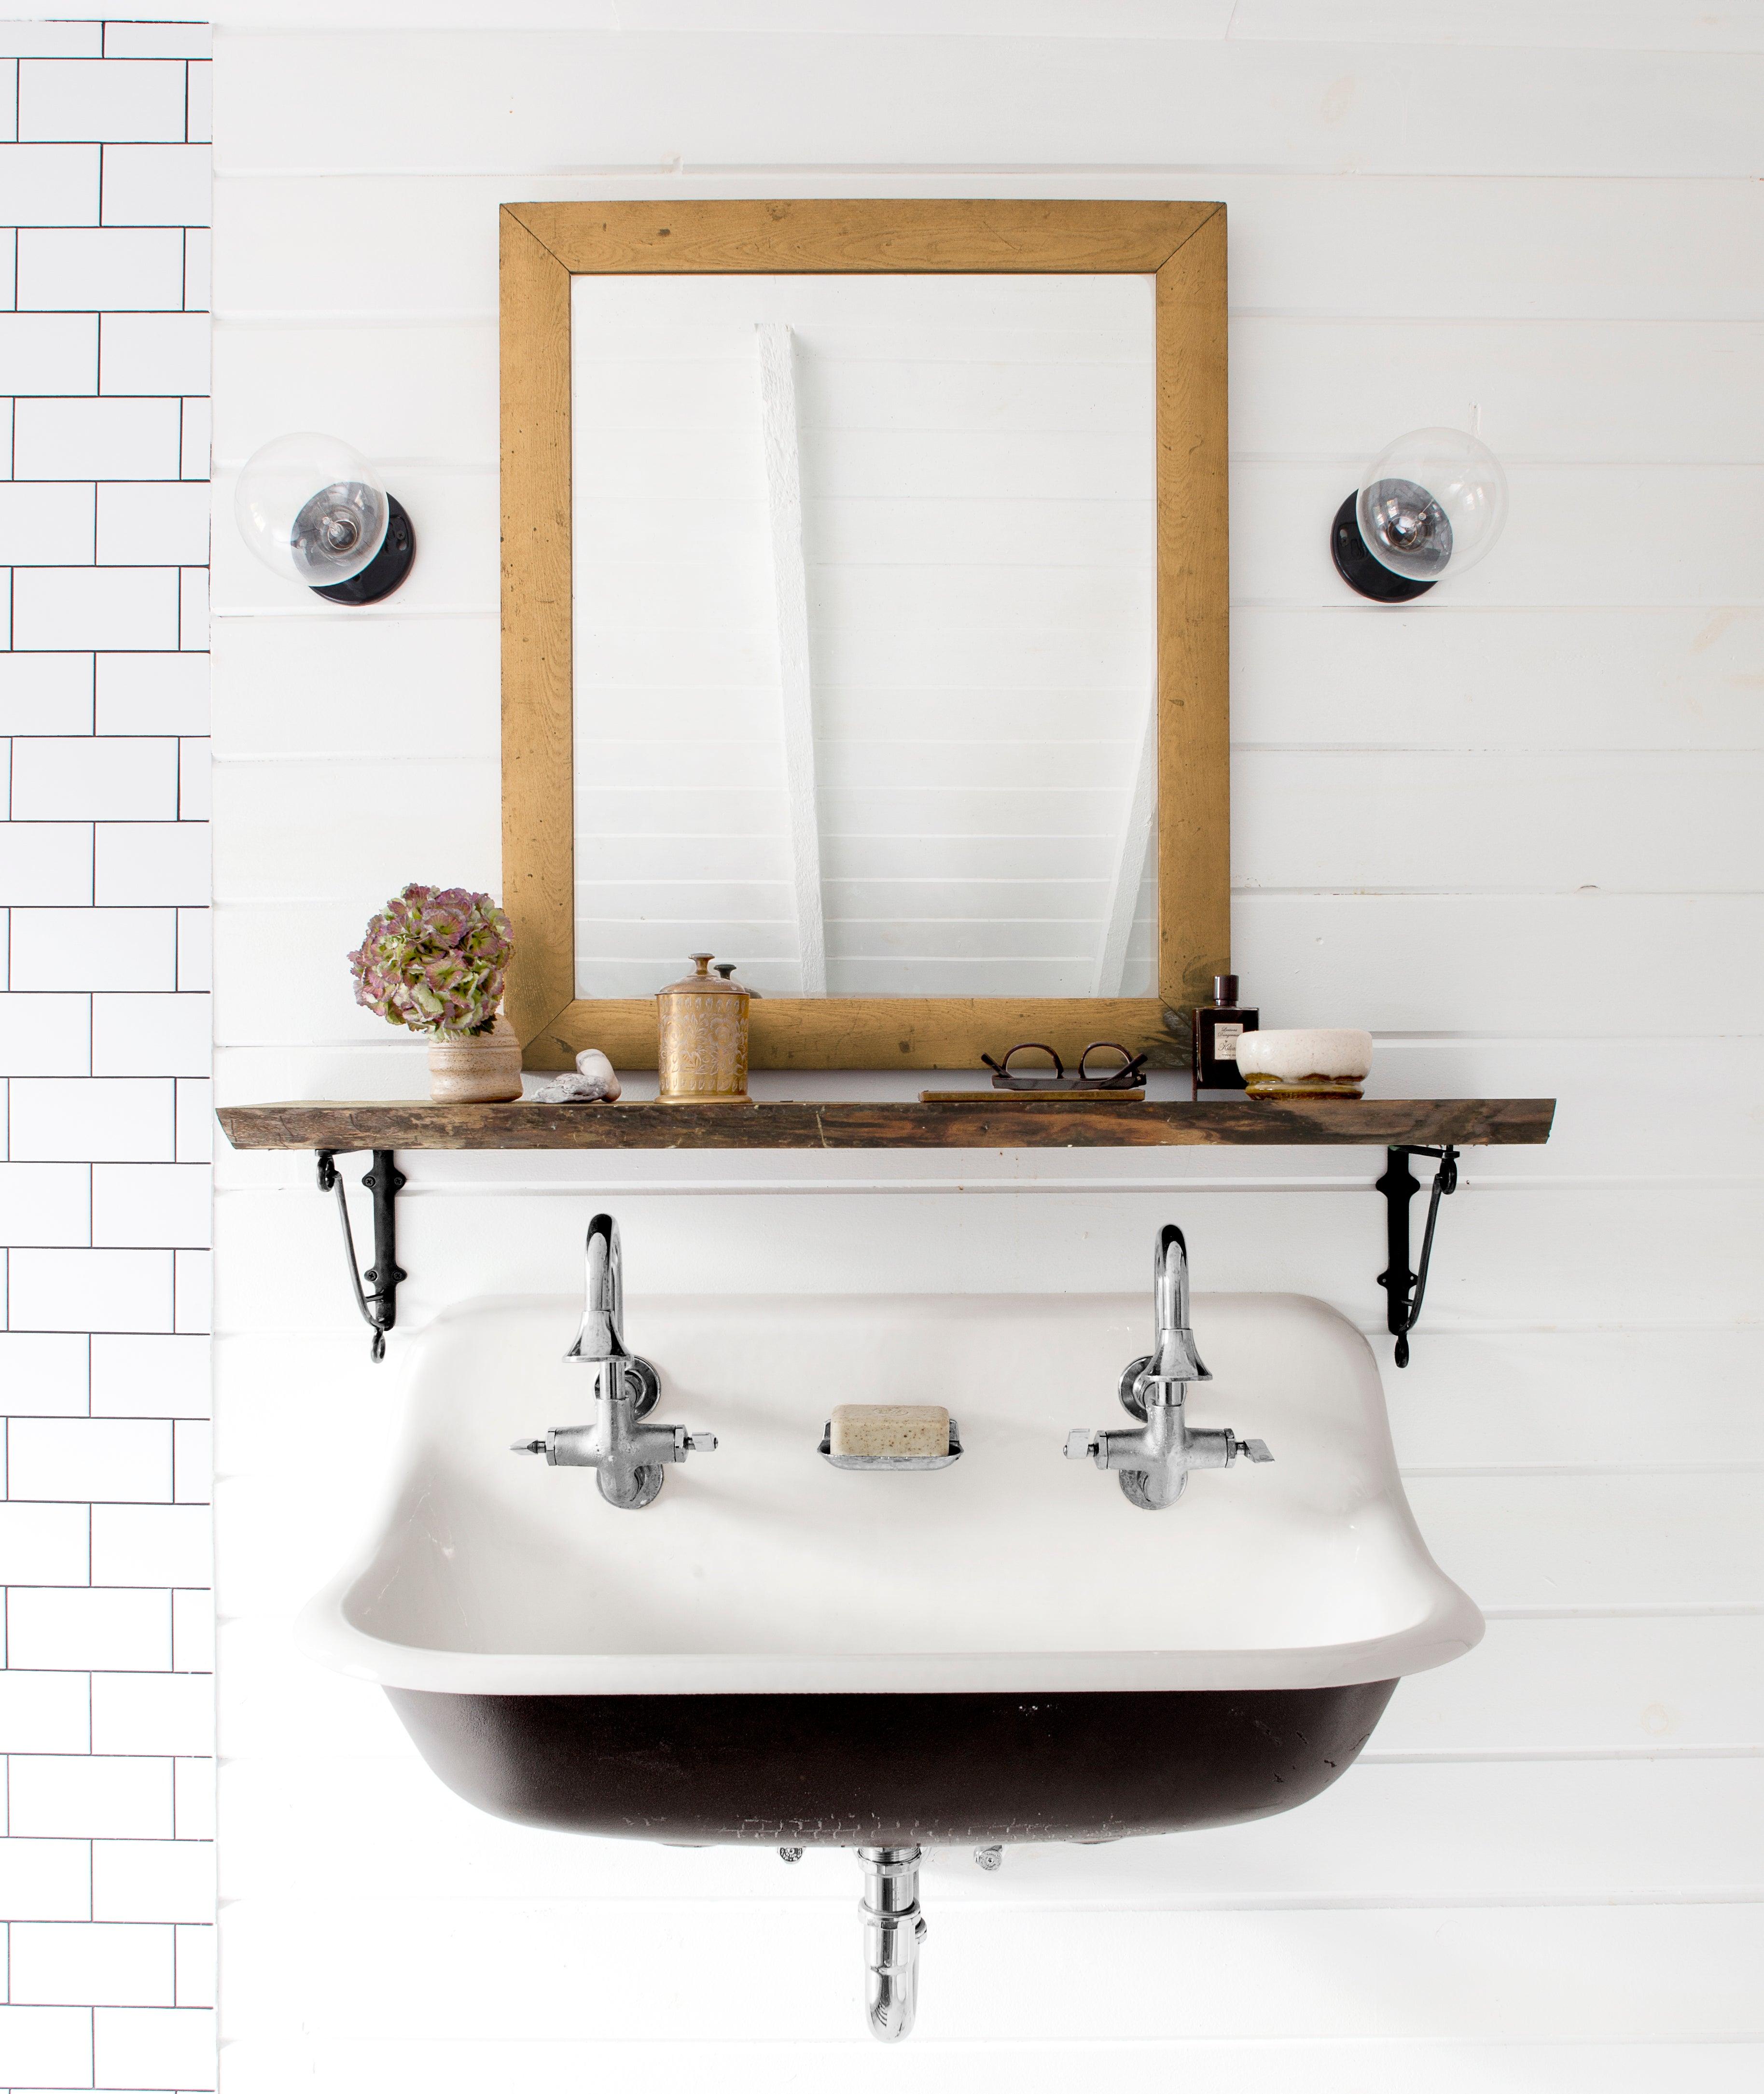 close up of a double faucet farmhouse sink